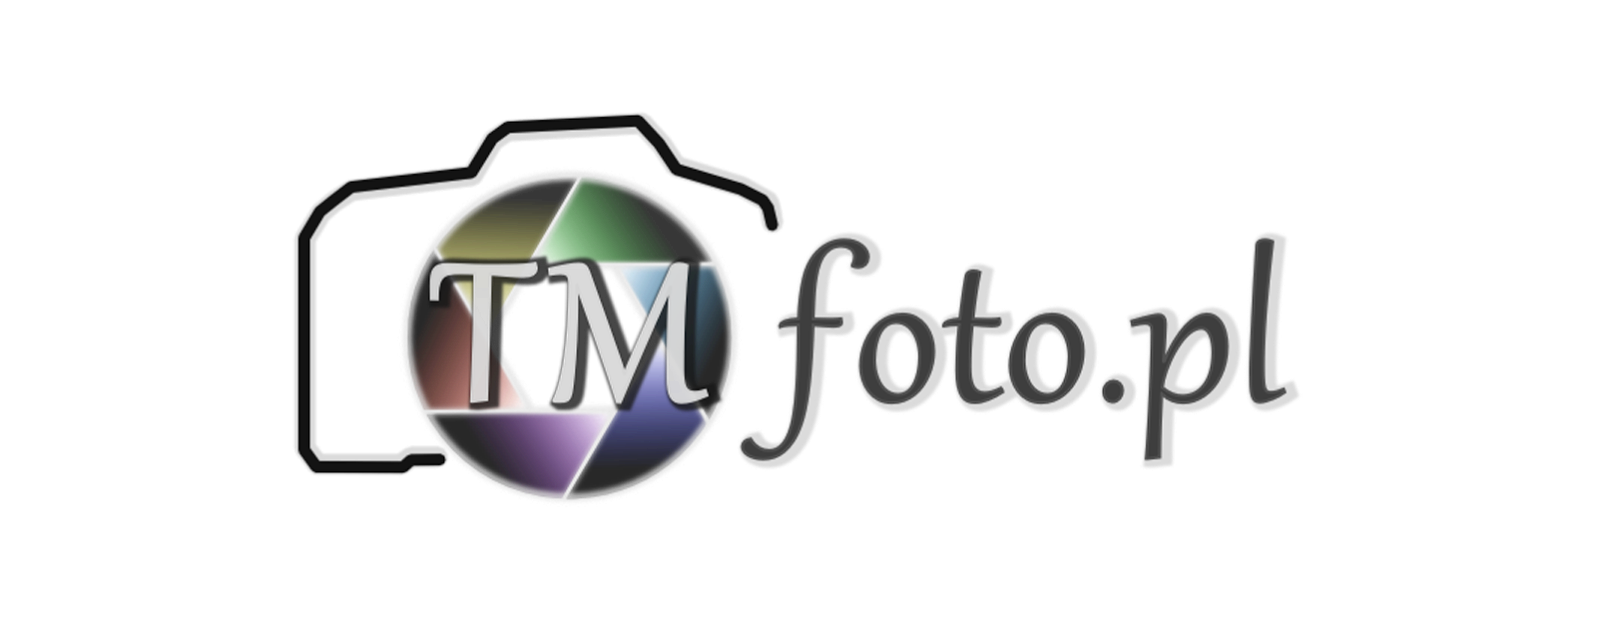 TMFOTO